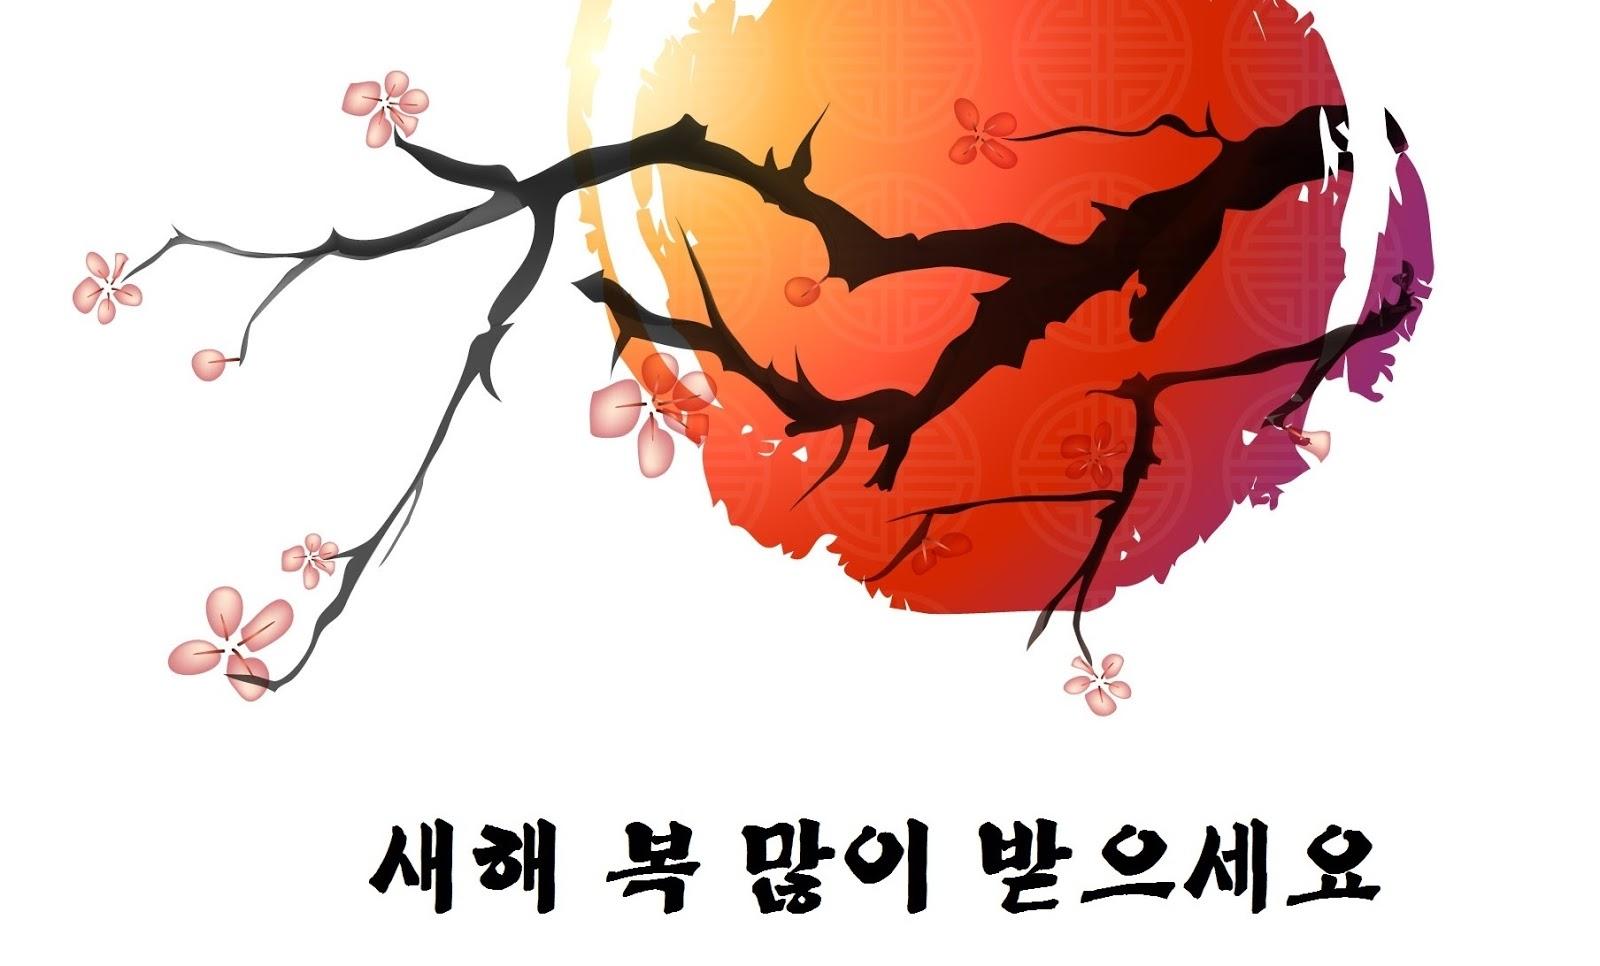 Seollal korean new year what does seollal means to koreans seollal korean new year what does seollal means to koreans kristyandbryce Images